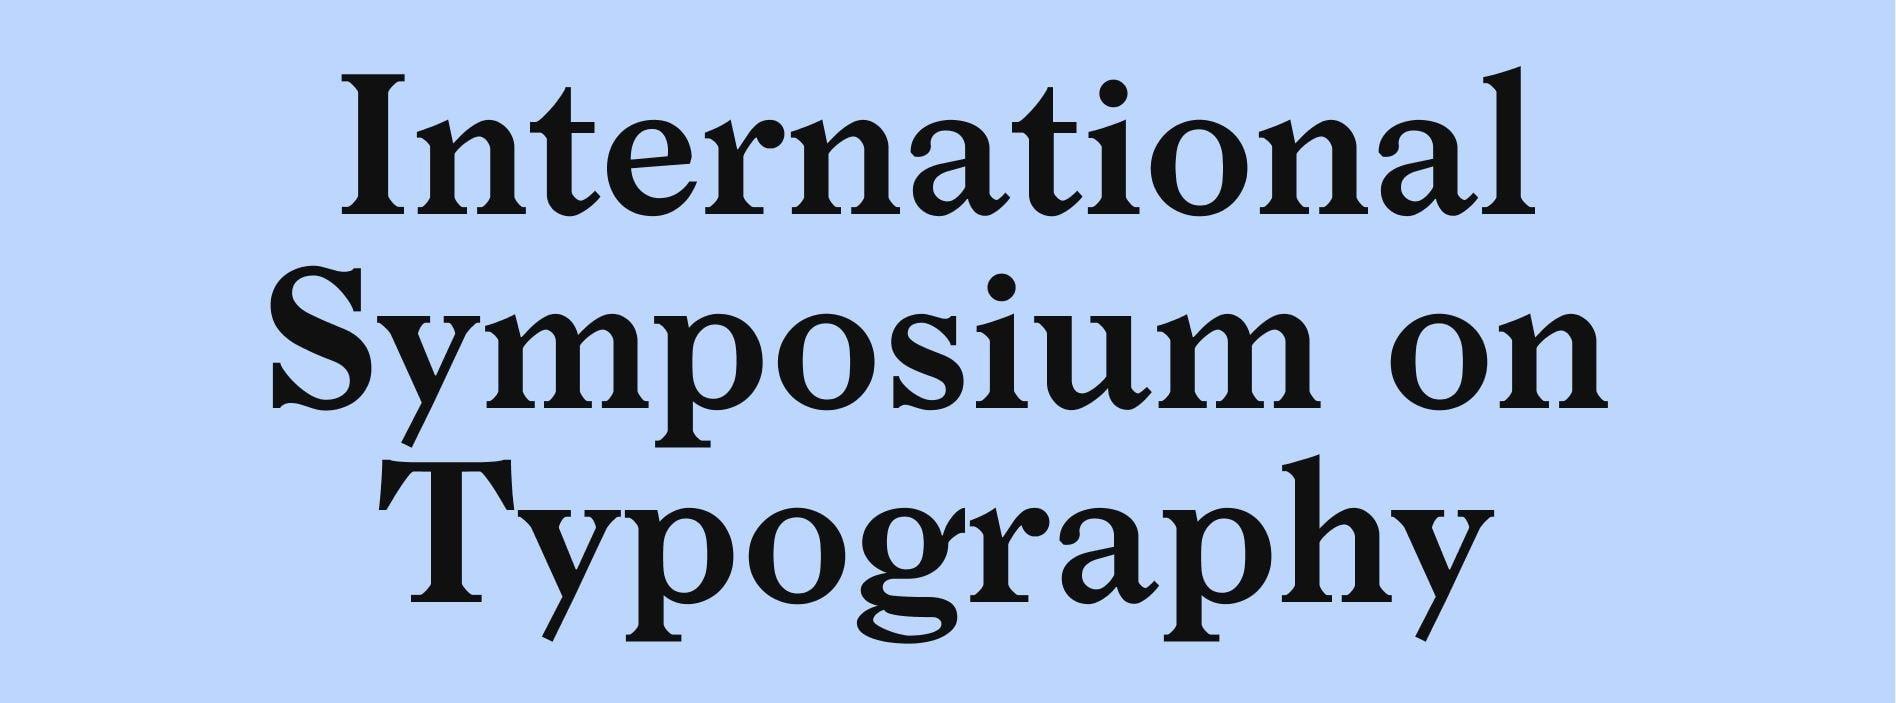 International Symposium on Typography   NGV